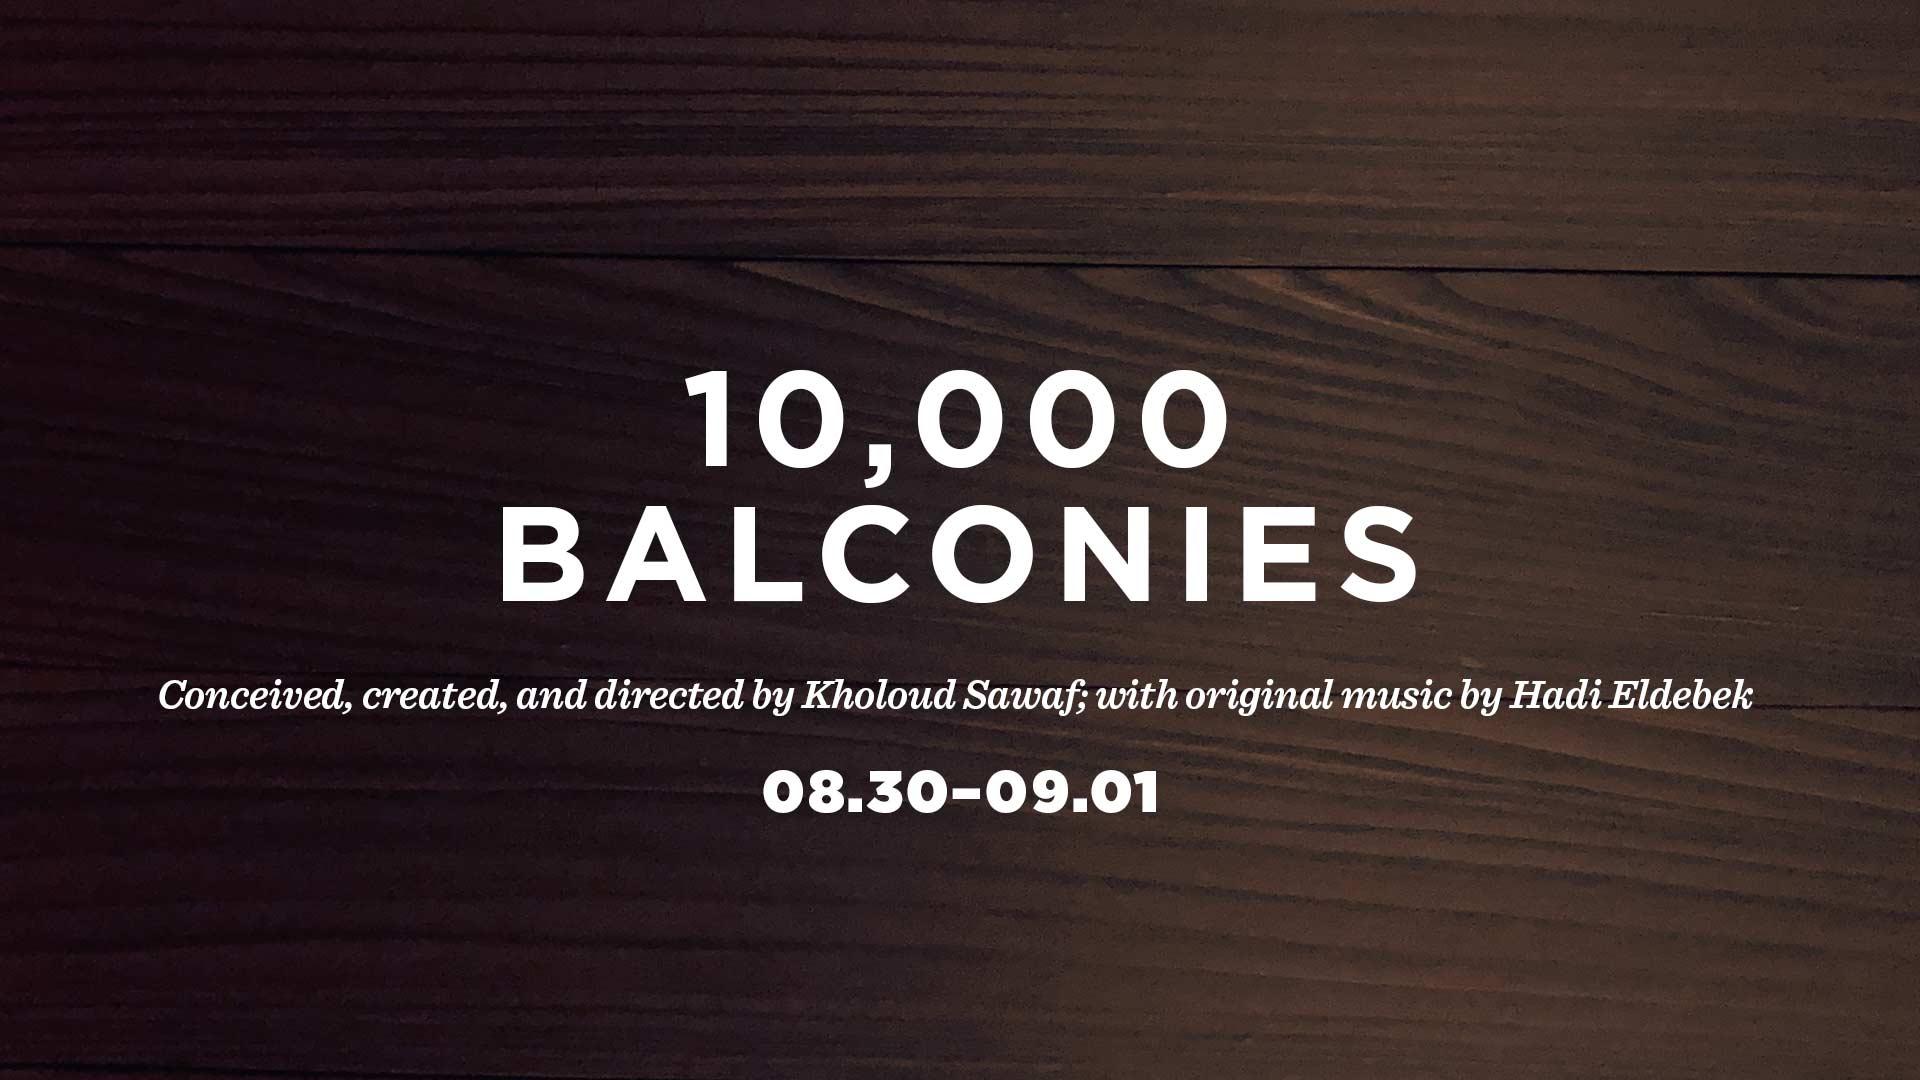 Show-Website-Page-Header-10K-Balconies-1-1920x1080.jpg